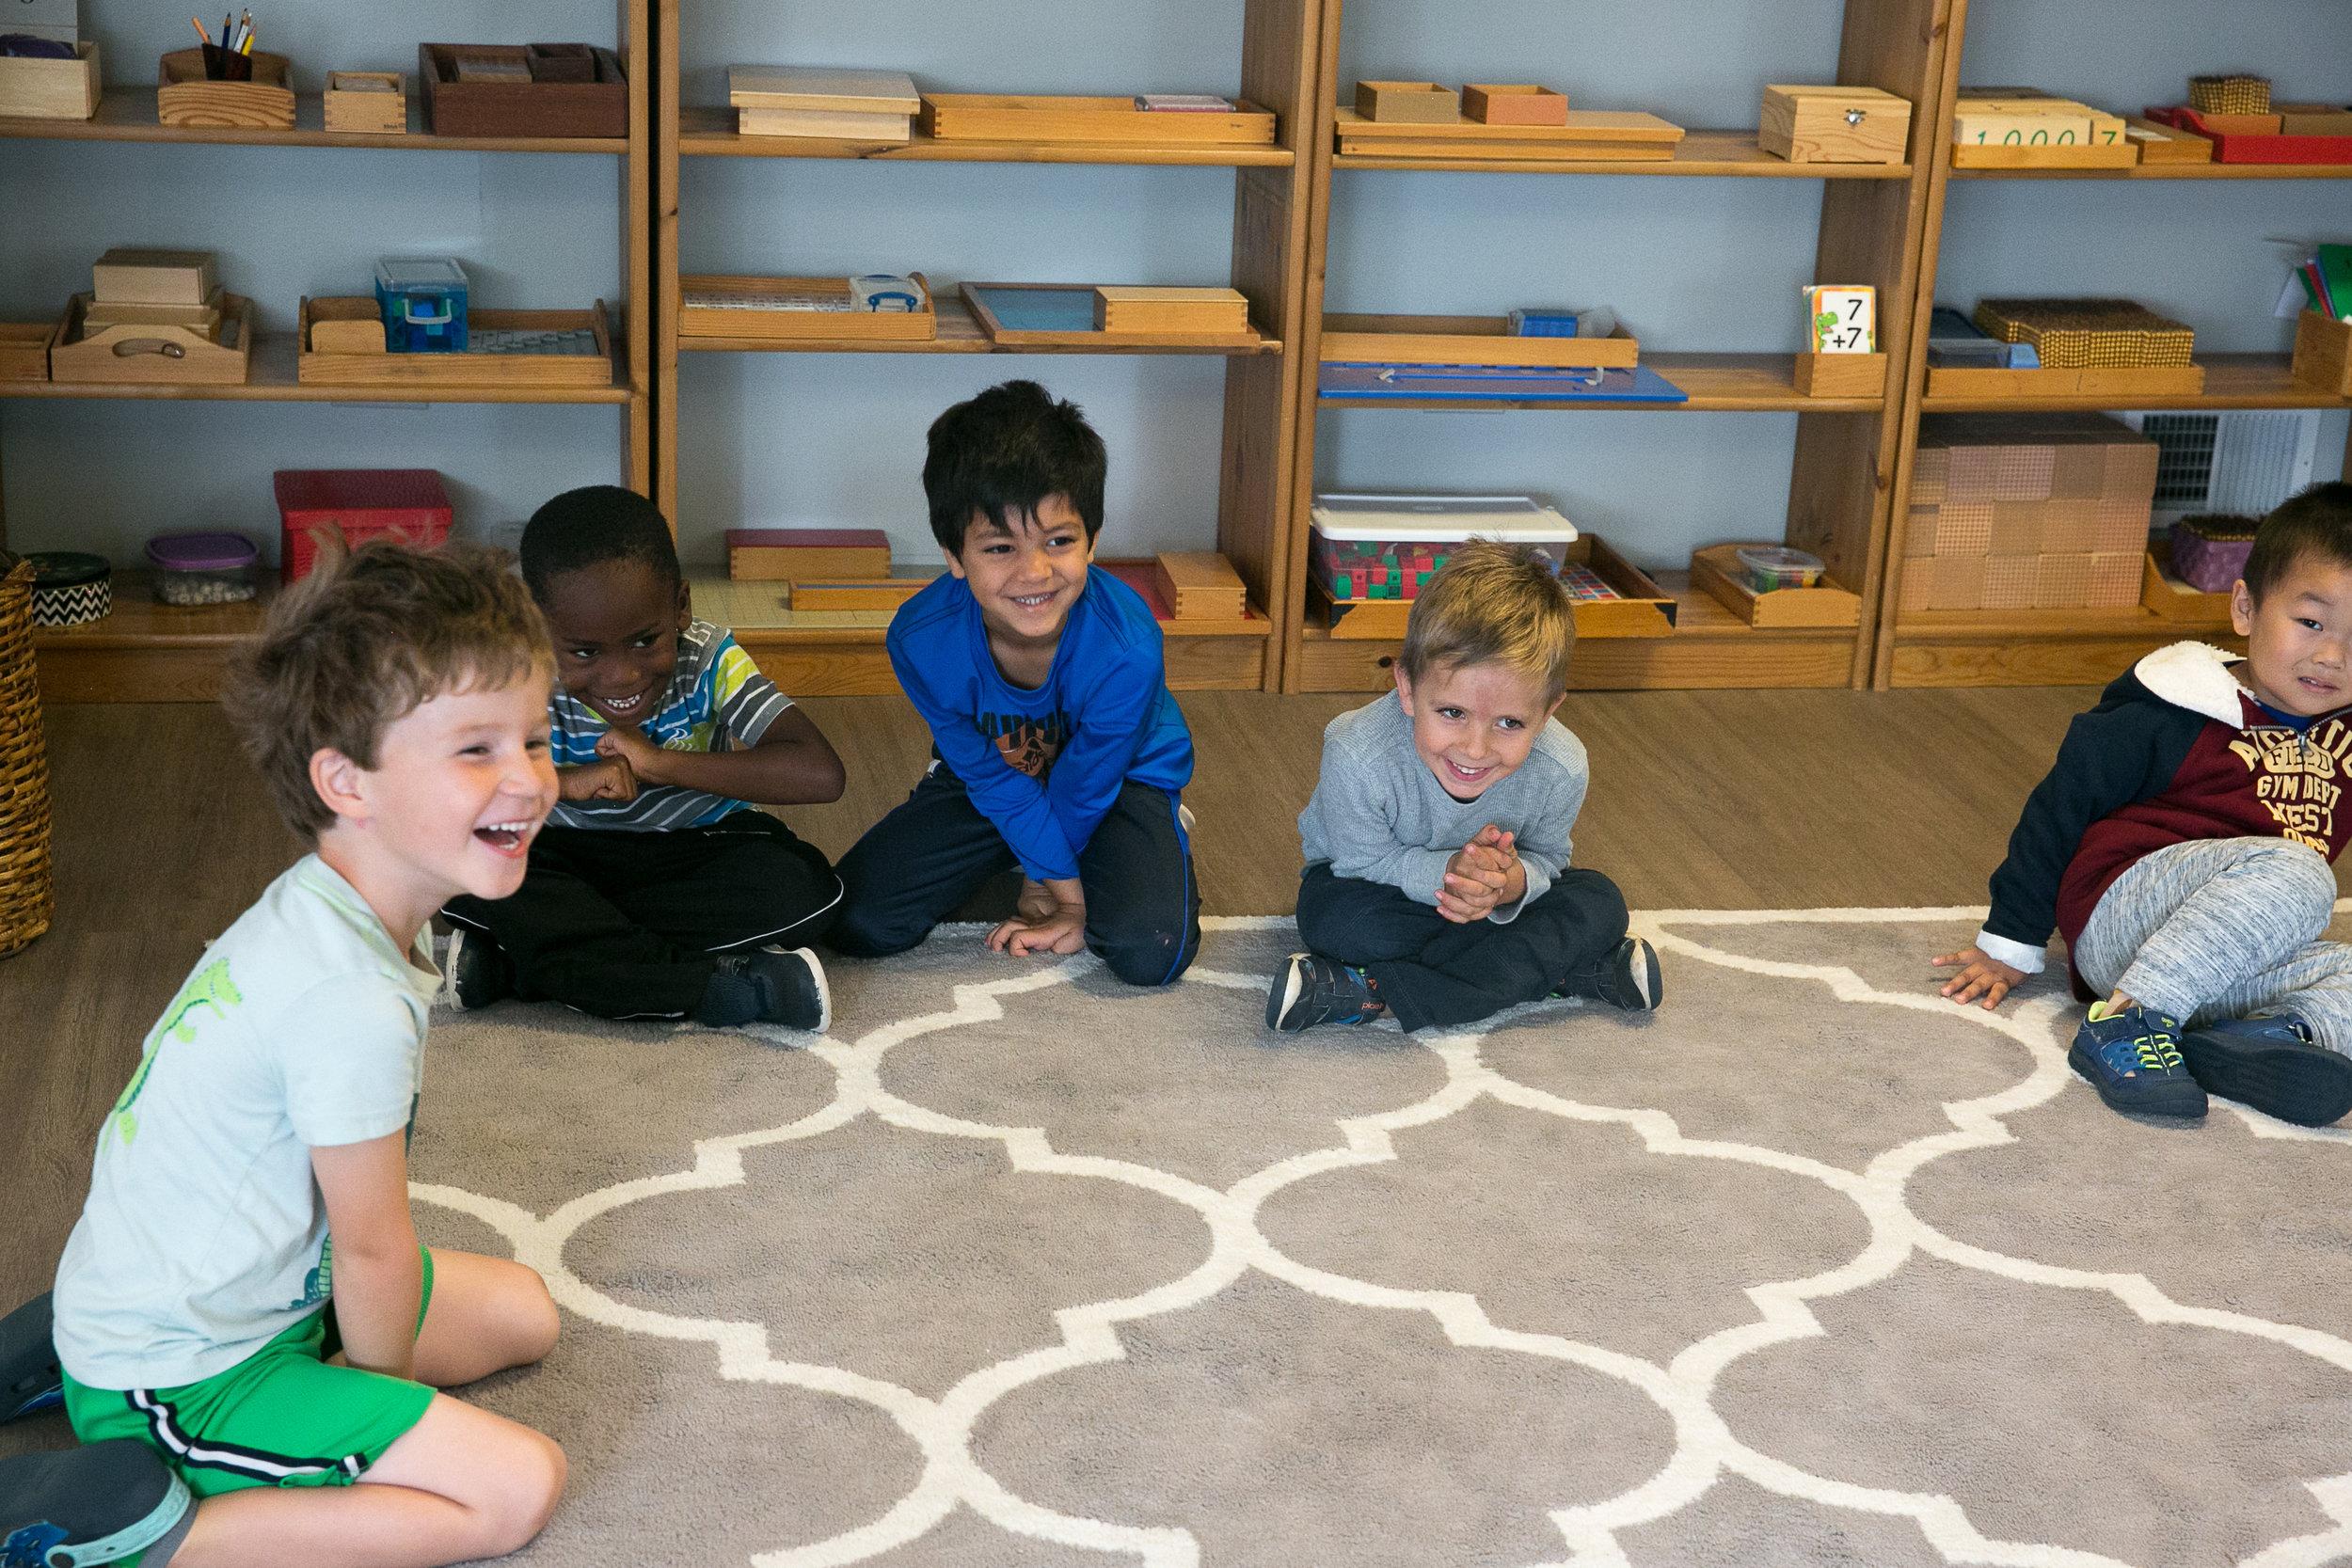 Rosehill_Montessori_Preschool_Kindergarten_classroom_classmates_music_Play.jpg